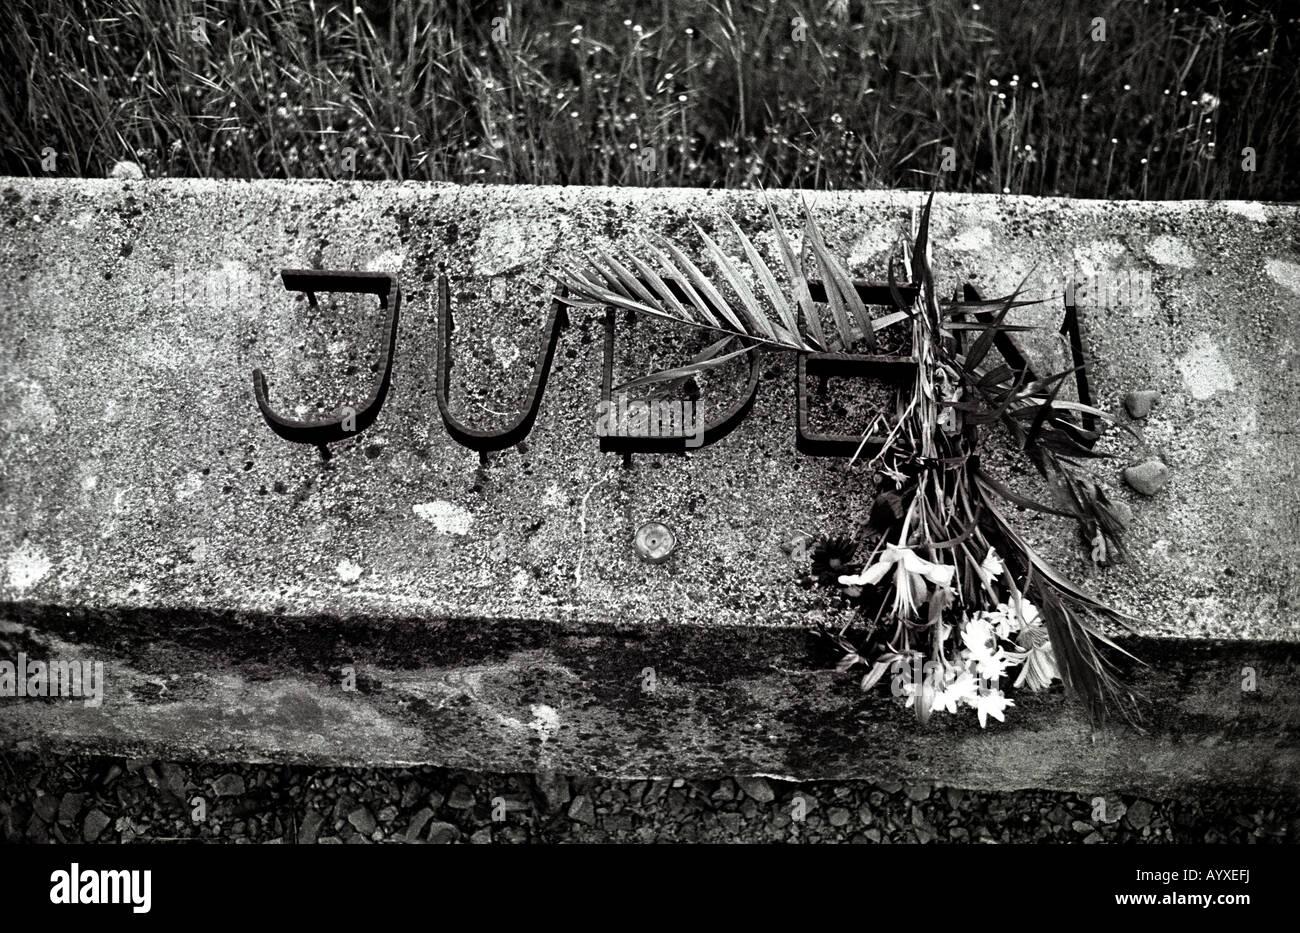 GERMANY NORDHAUSEN MITTELBAU DORA CONCENTRATION CAMP V1 V2 NAZI CATTLE WAGON WW11 WW2 JUDEN JEW LOSS - Stock Image